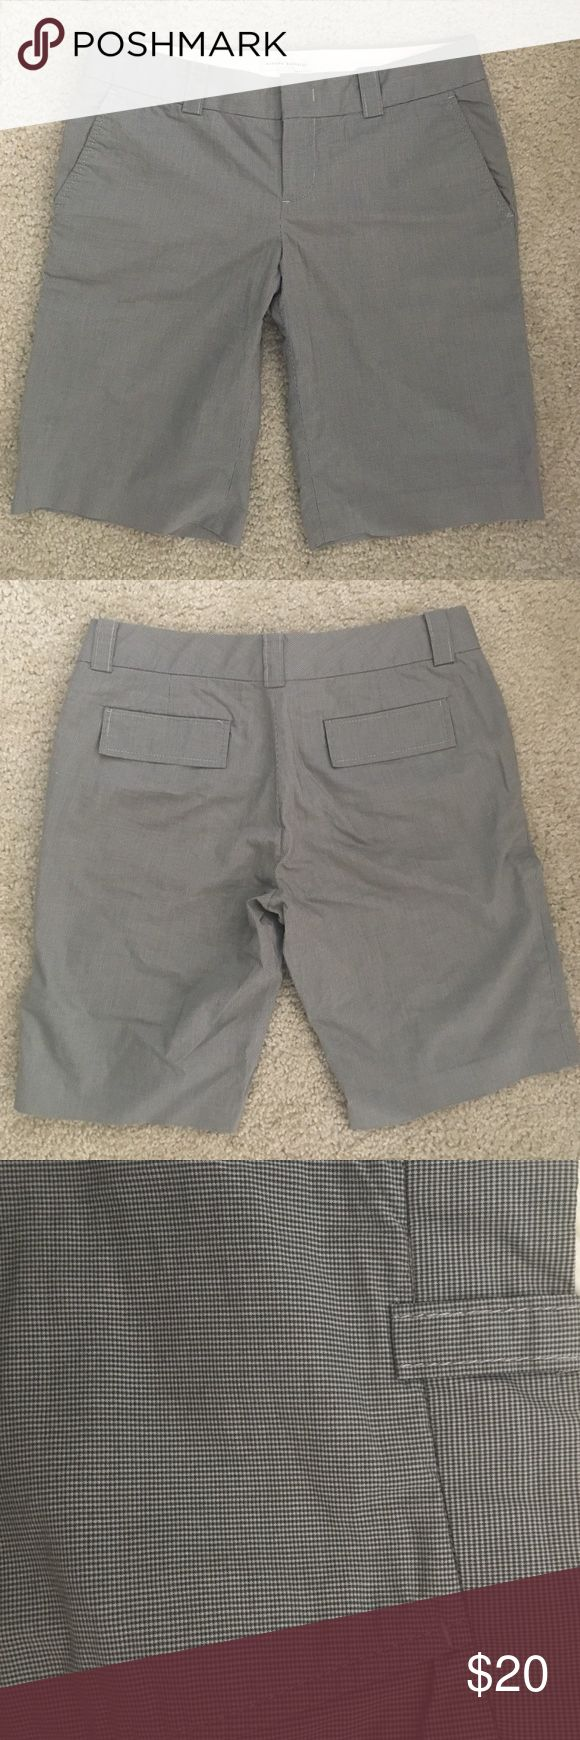 Banana Republic Women's Bermuda Chino Shorts Size 4. Gray. Bermuda Chino Shorts Banana Republic Shorts Bermudas